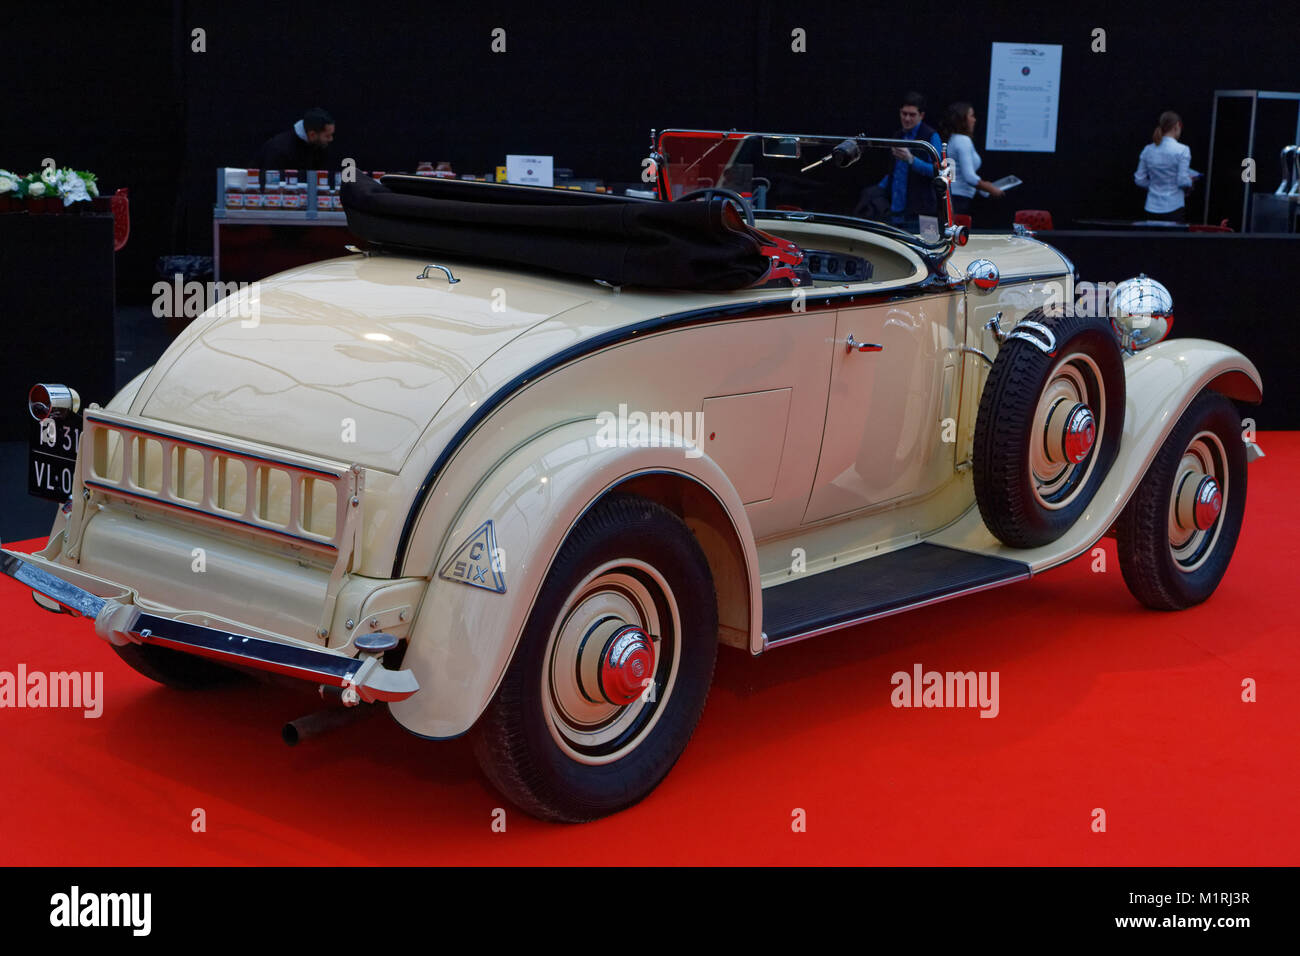 paris france 31st january 2018 citroen c6 cabriolet 1931 the stock photo 173237451 alamy. Black Bedroom Furniture Sets. Home Design Ideas